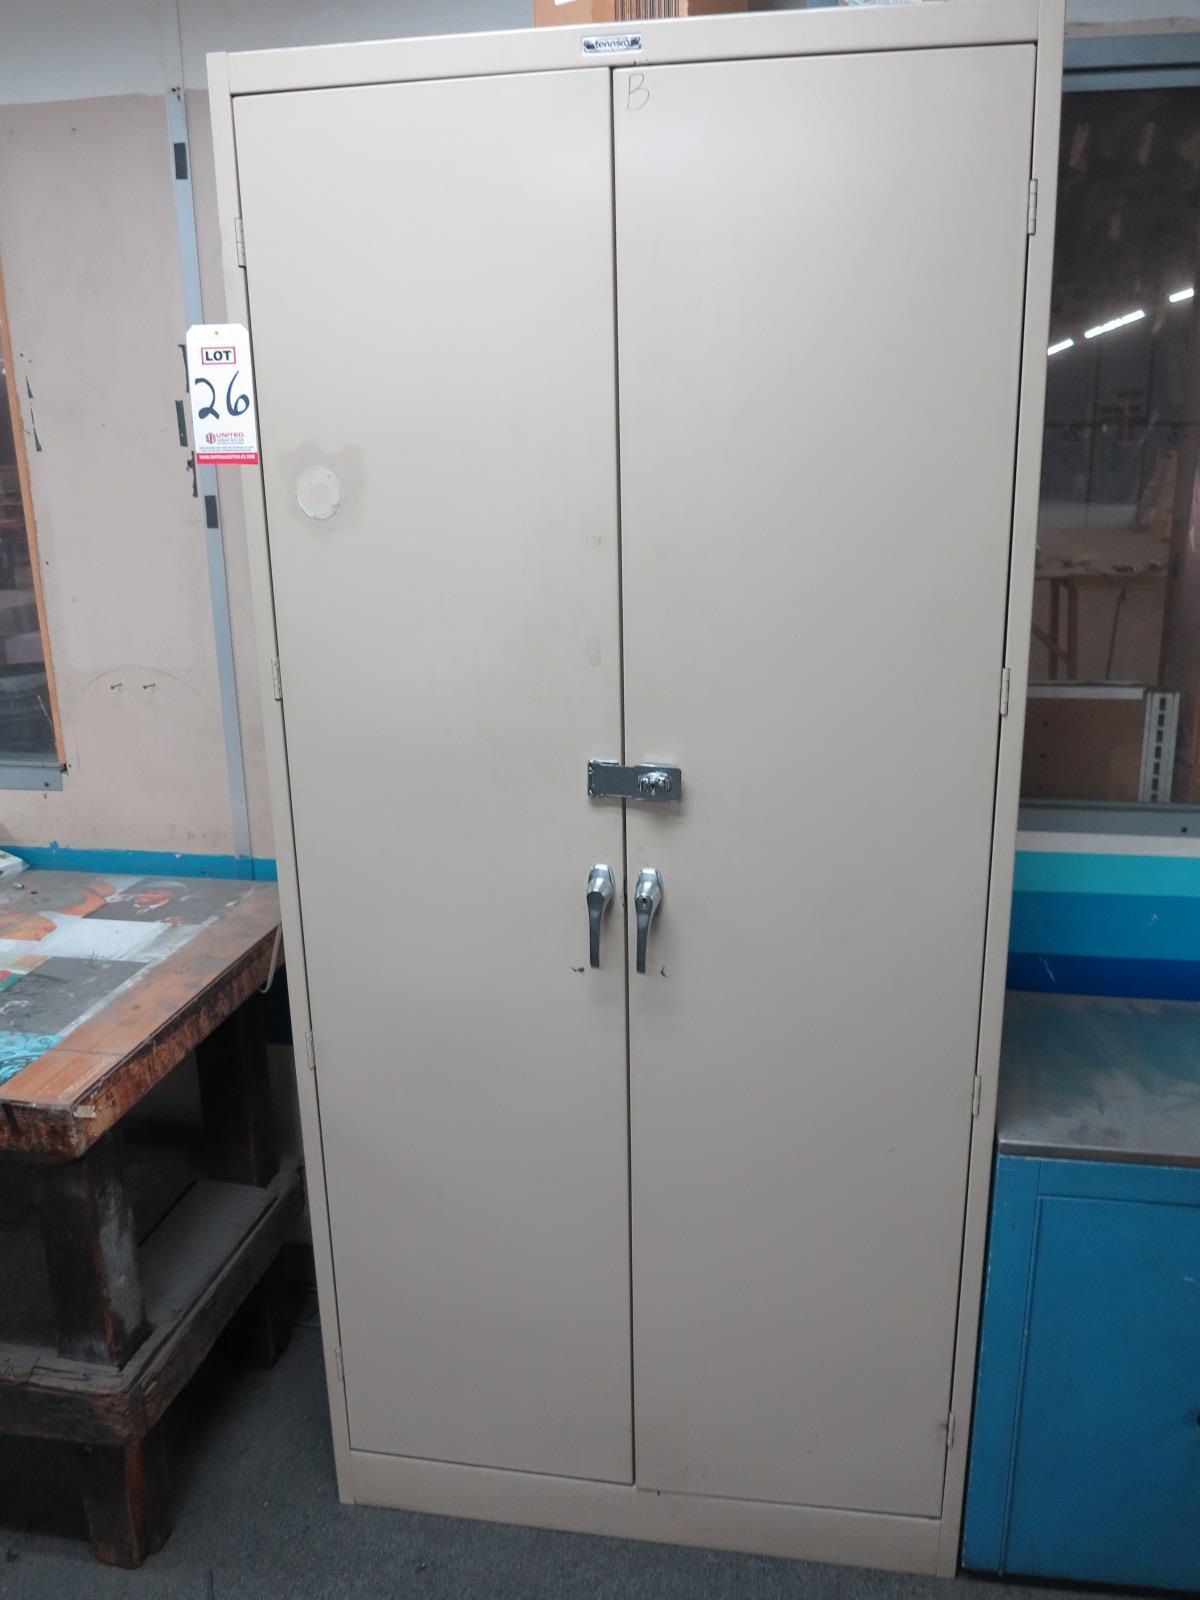 2-DOOR TENNSCO STORAGE CABINET, LOCKING, COMES W/ KEY